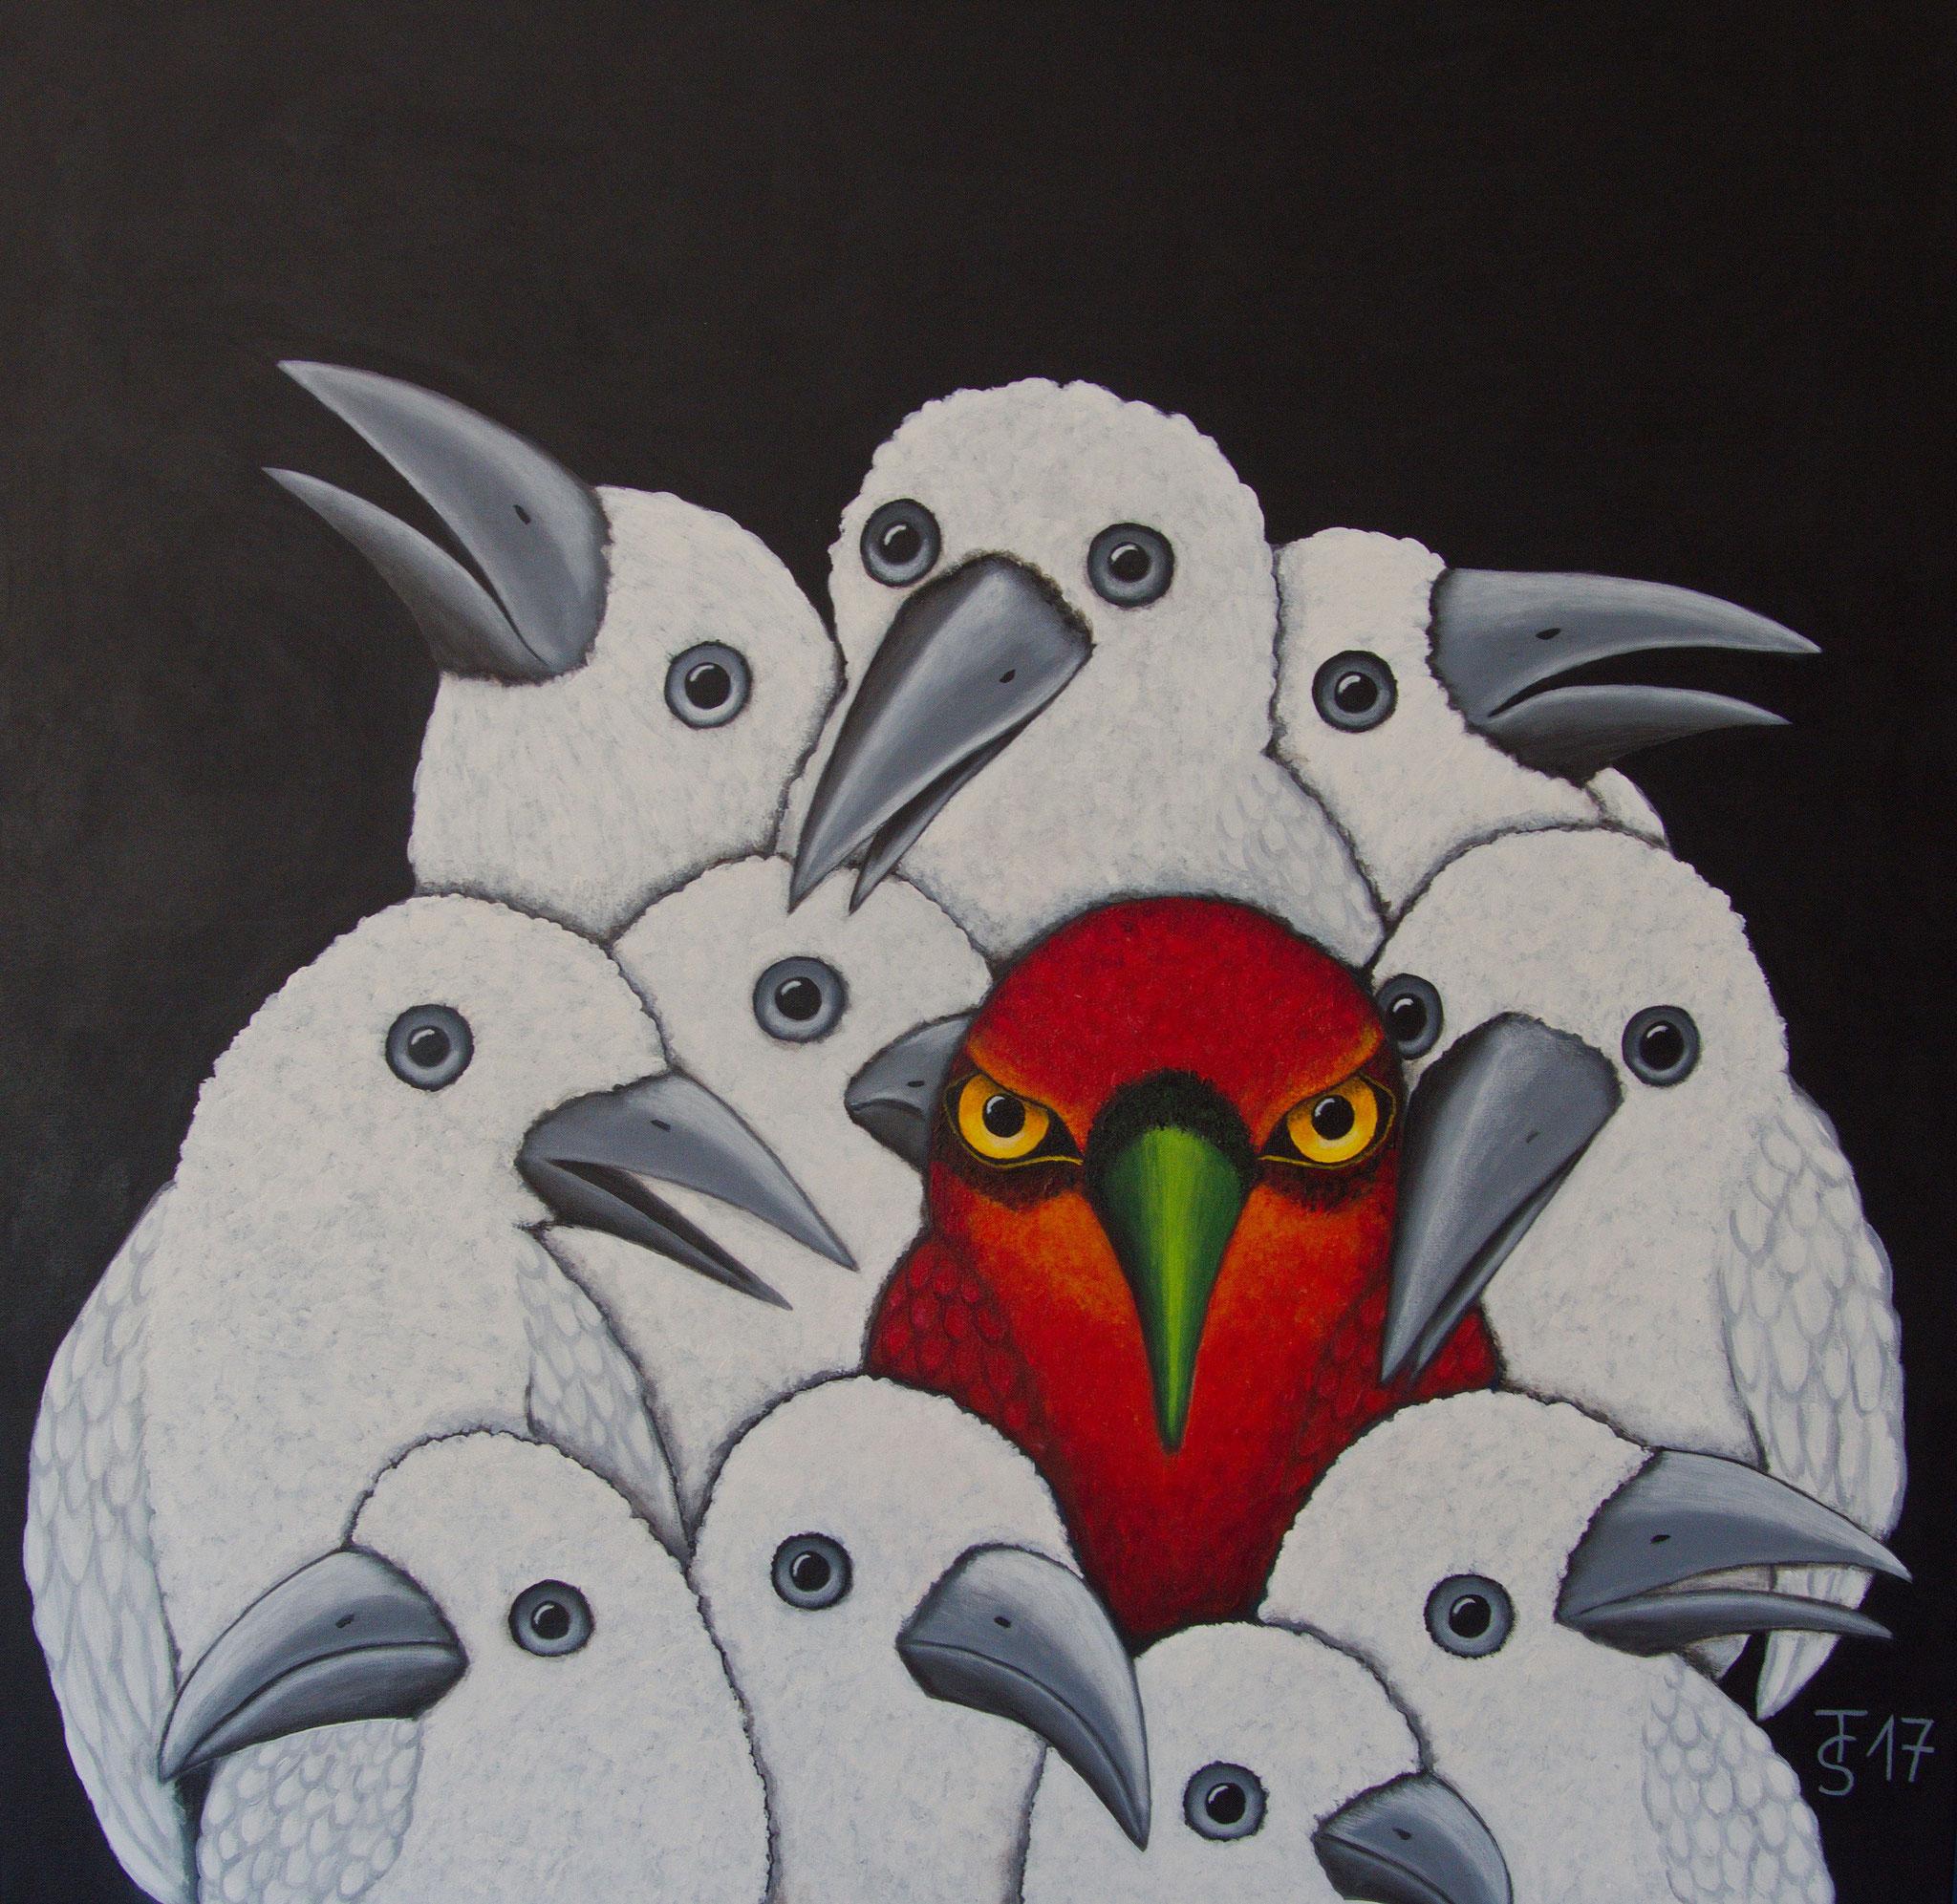 Grünschnabel_ (Acryl auf Leinwand, 100 x 100 cm)